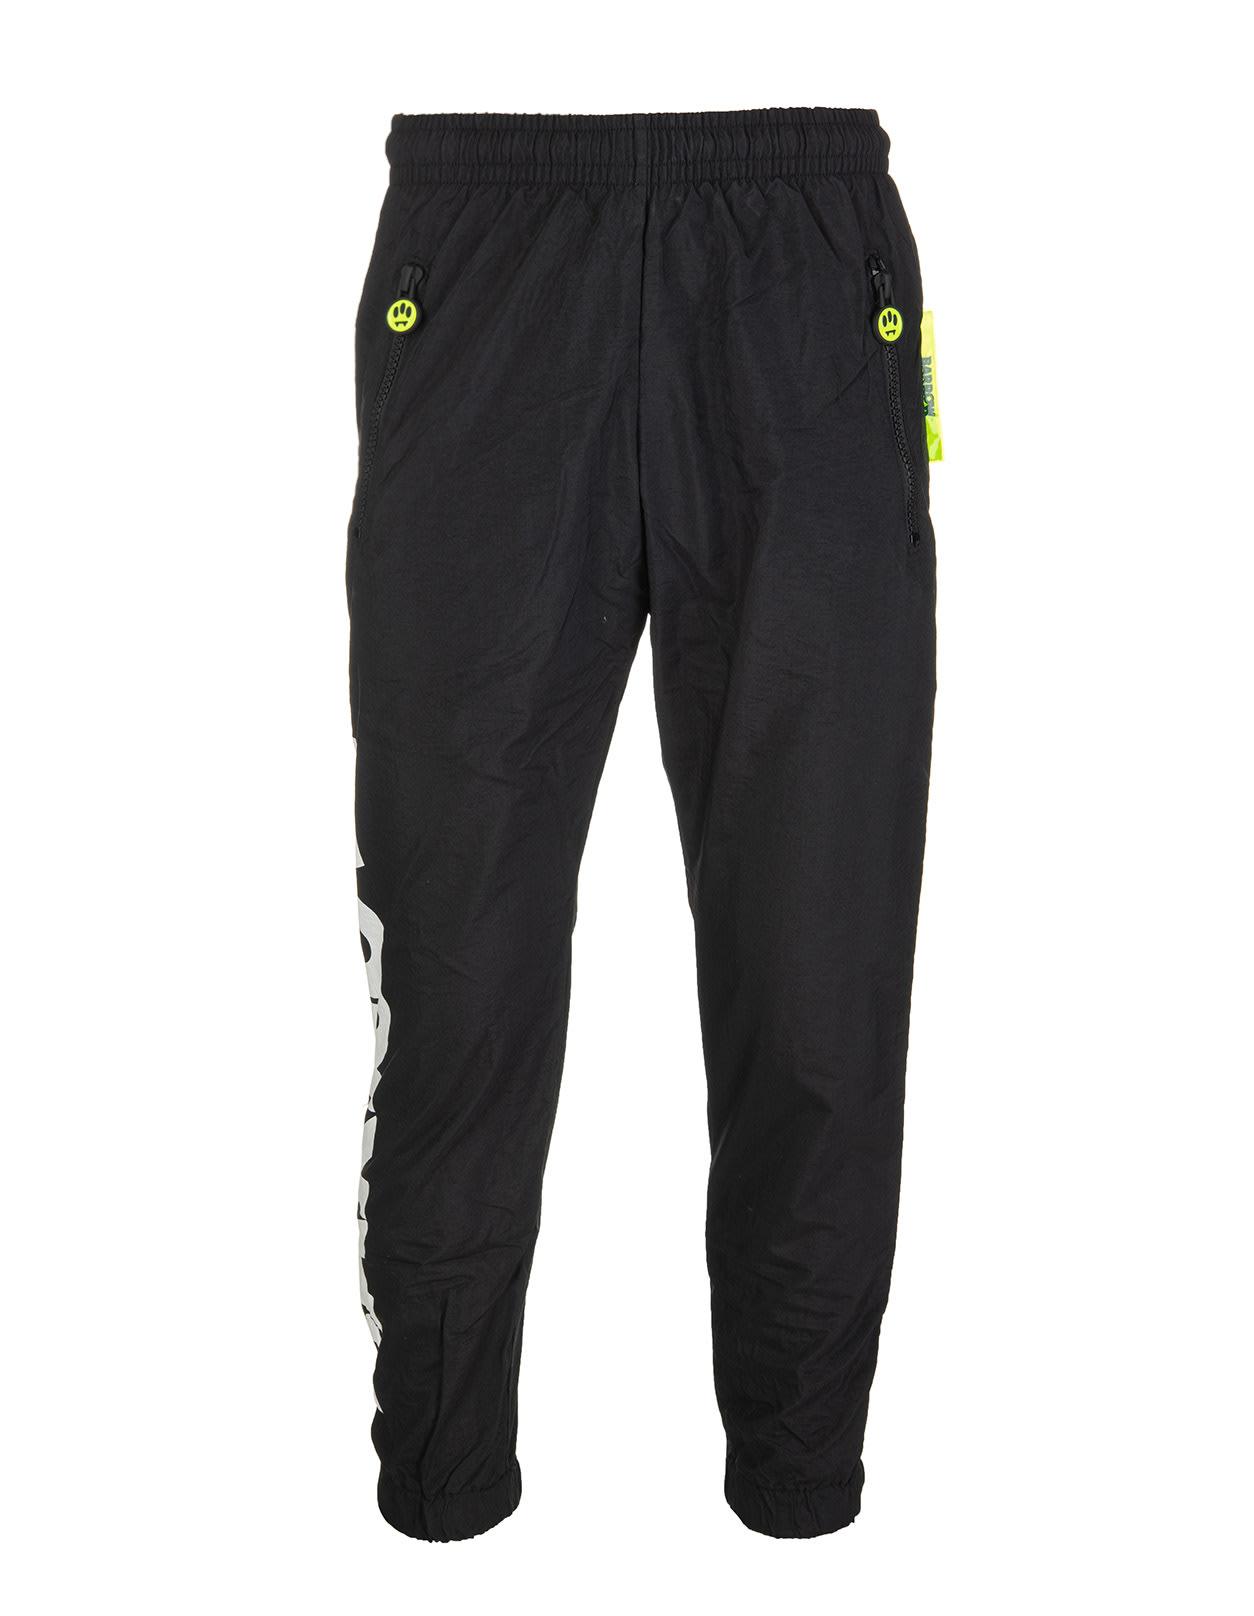 Barrow Unisex Black Nylon Joggers With Logo In Nero